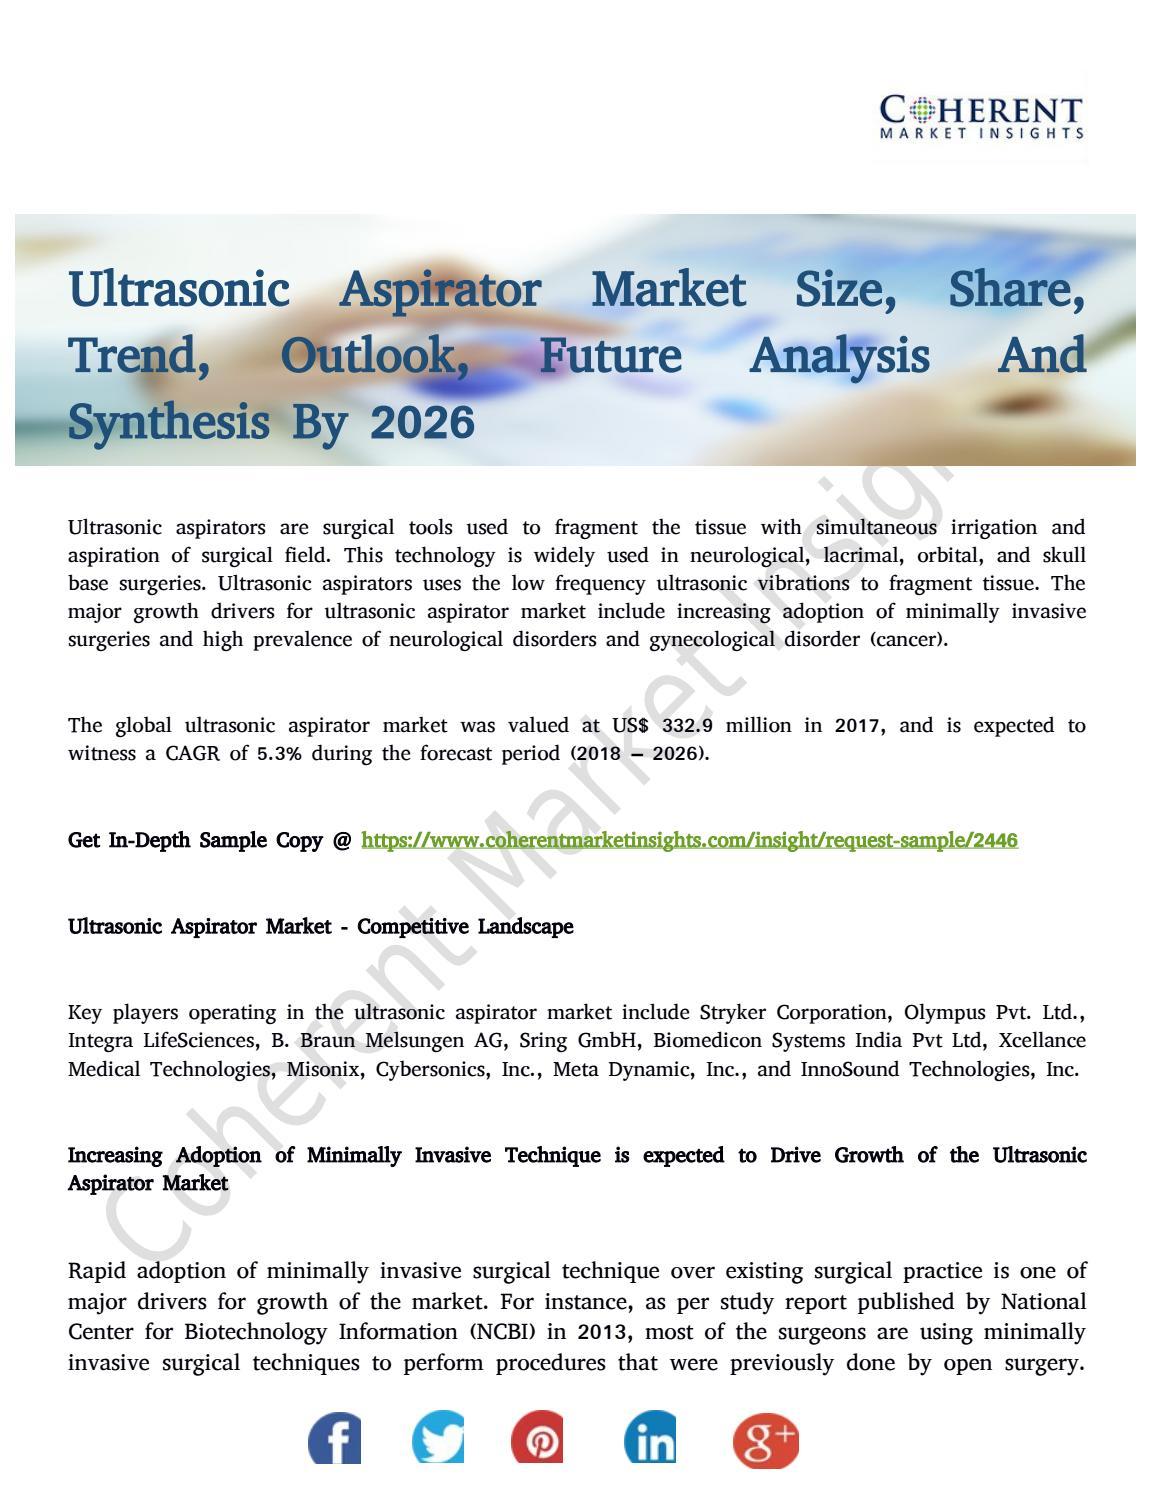 Ultrasonic Aspirator Market 2026 Research Highlighting Major